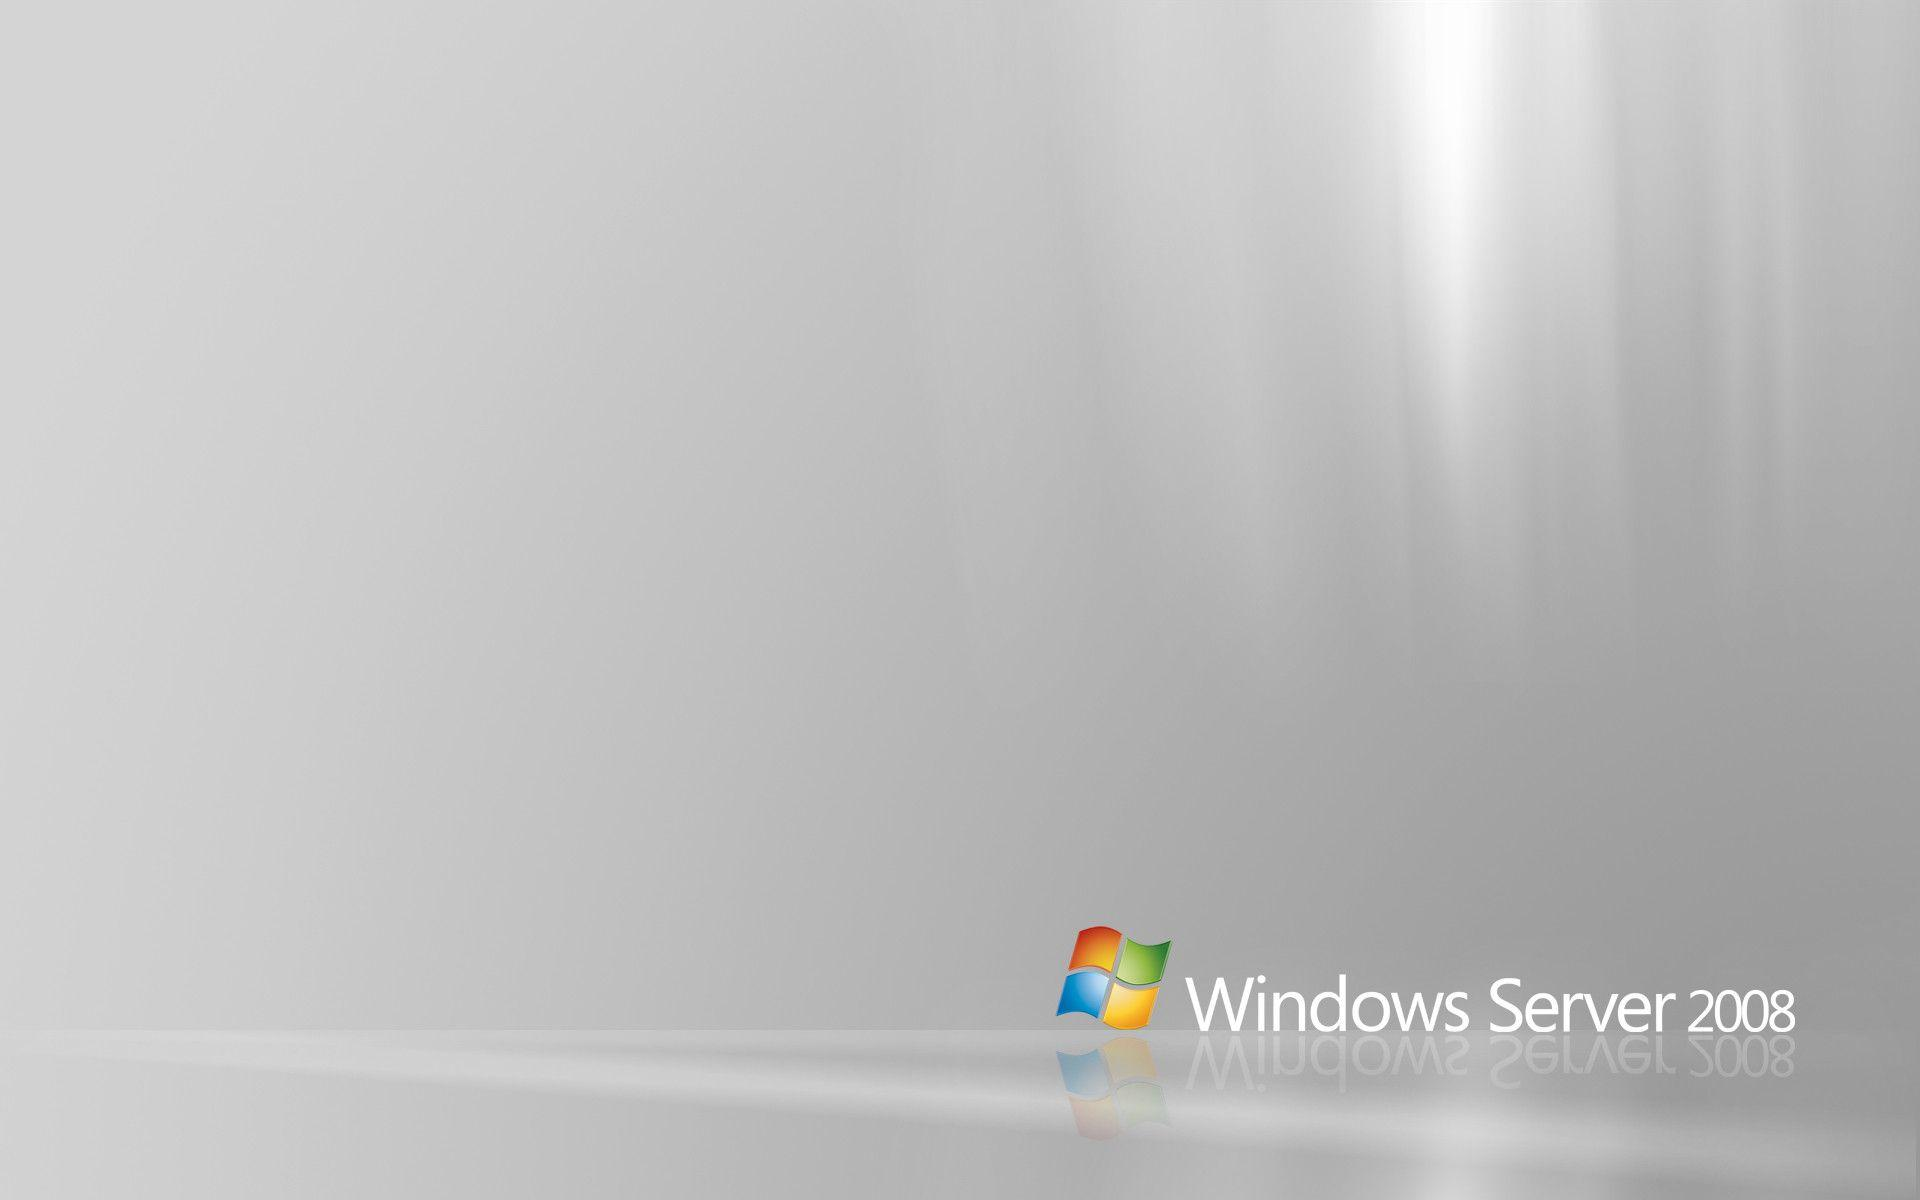 Windows server wallpapers wallpaper cave.